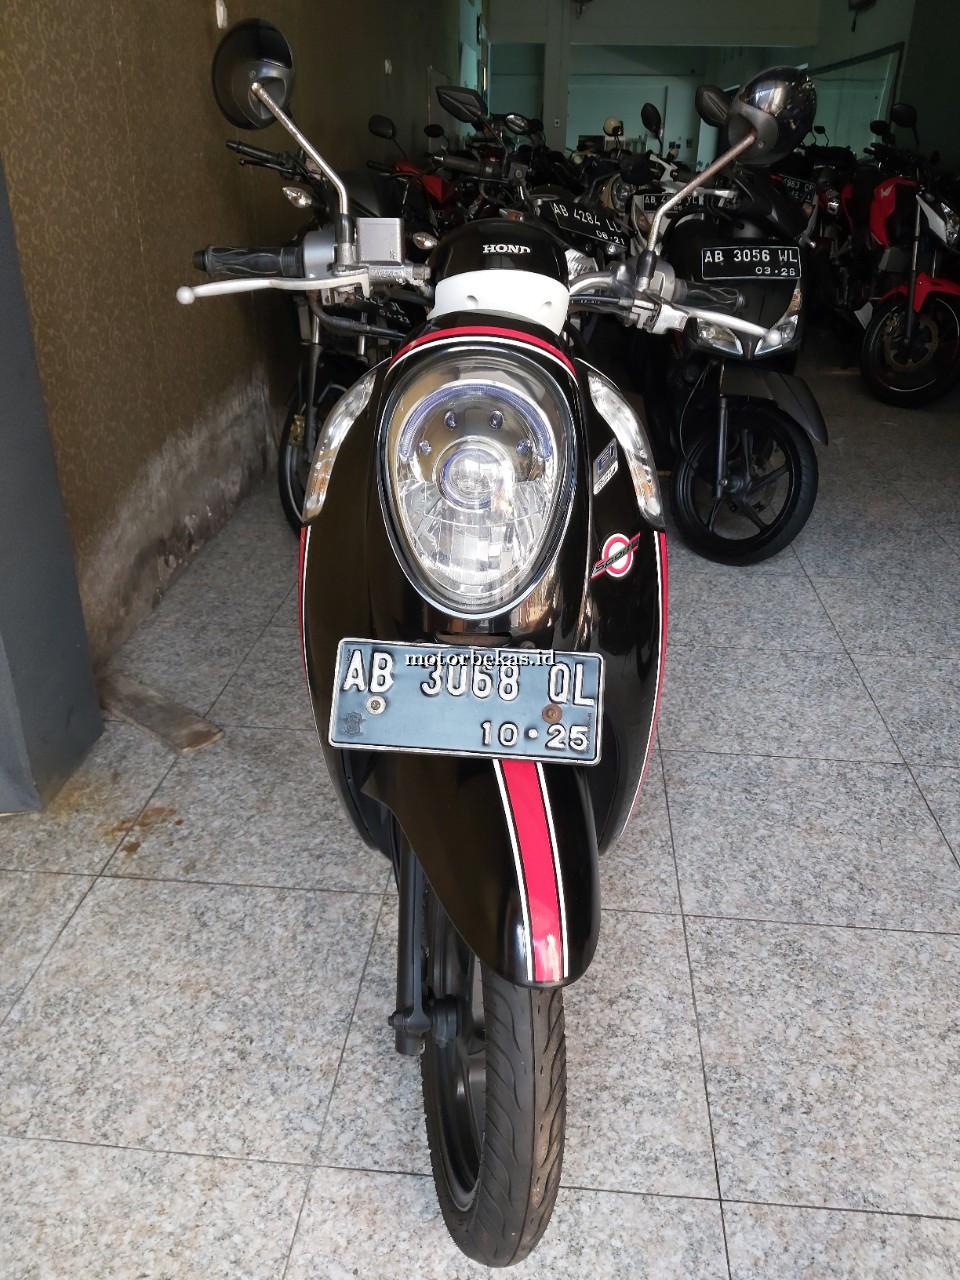 HONDA SCOOPY SPORTY FI 5 motorbekas.id